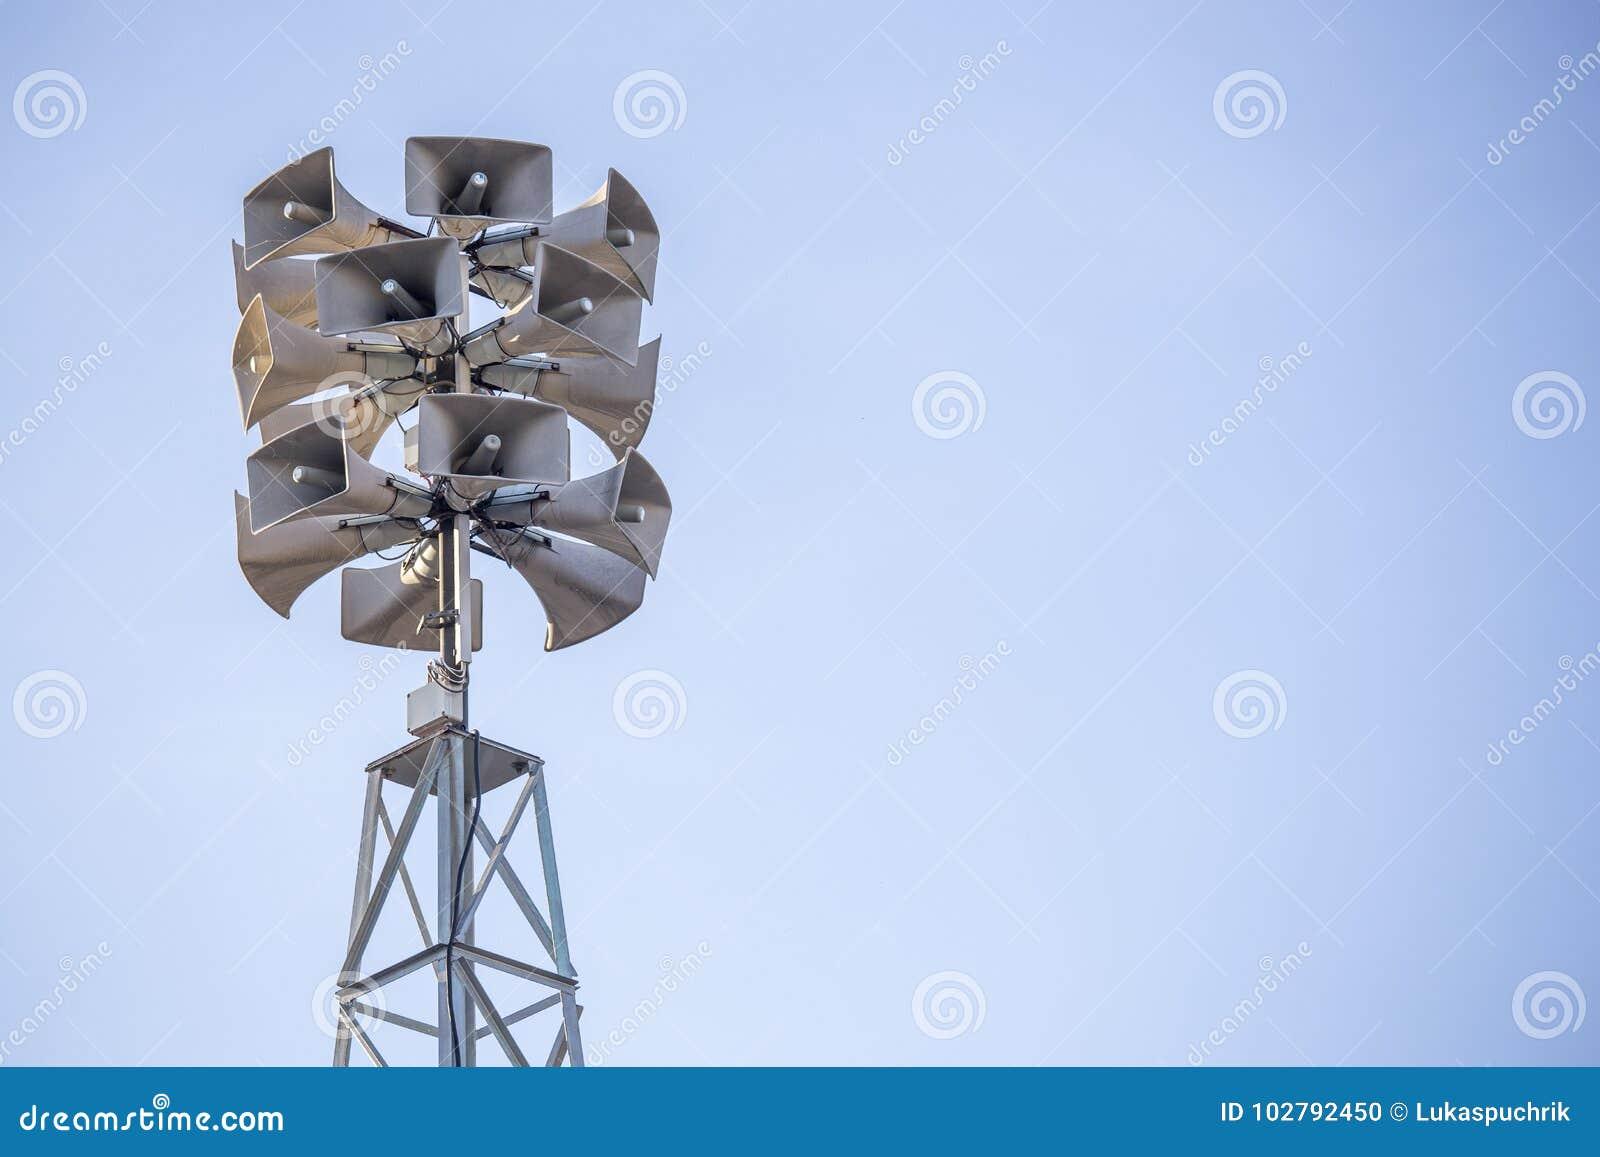 Toren met bos van luidsprekers voor mededeling en announcin